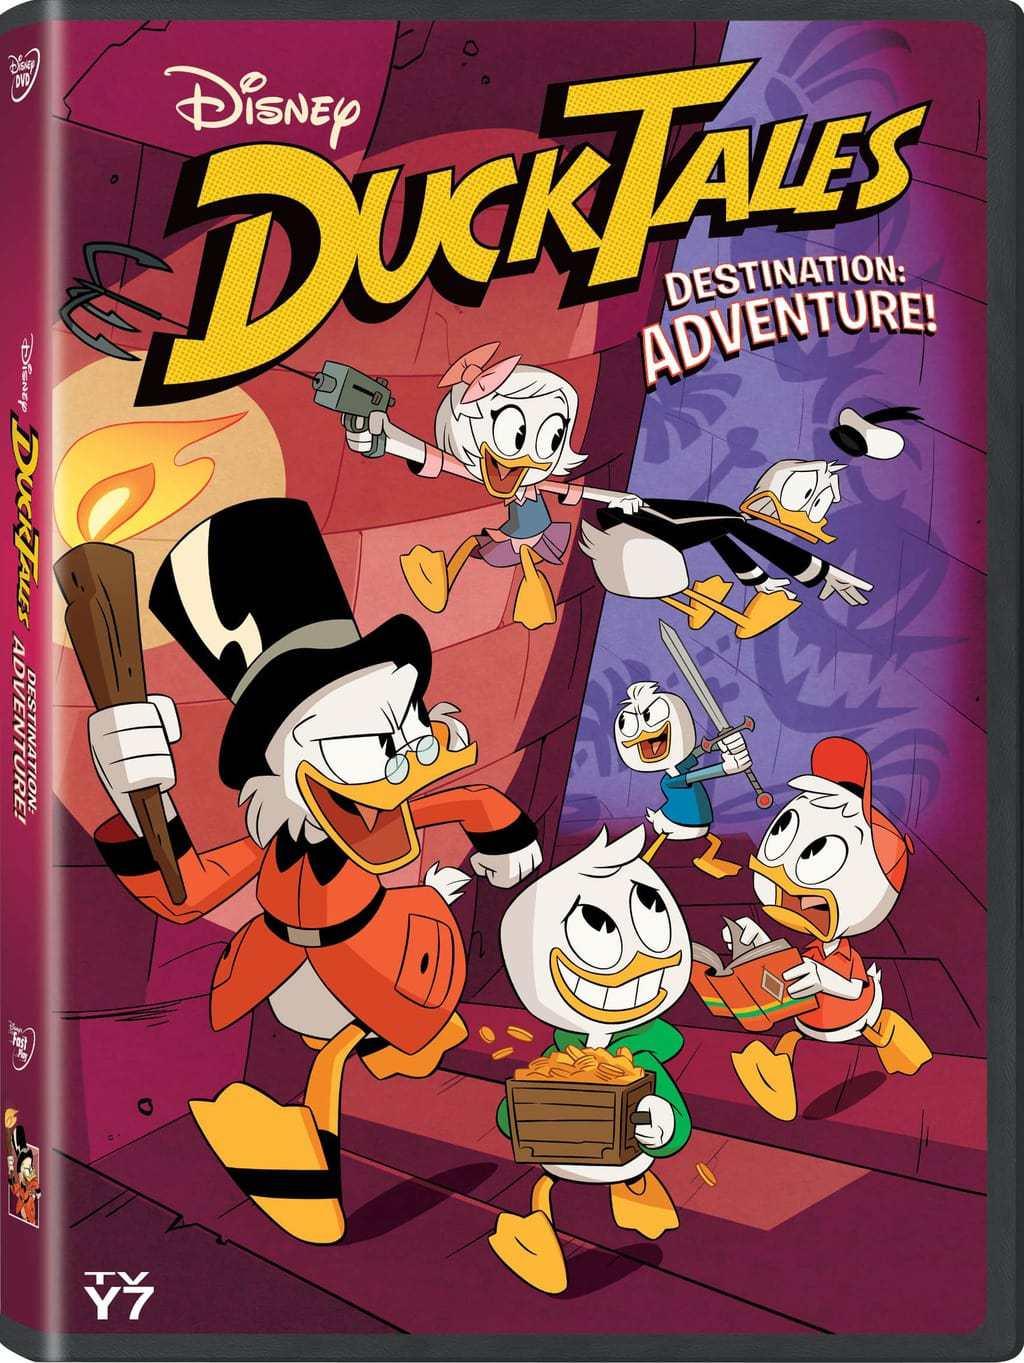 Disney's Ducktales: Destination Adventure Movie Promotion